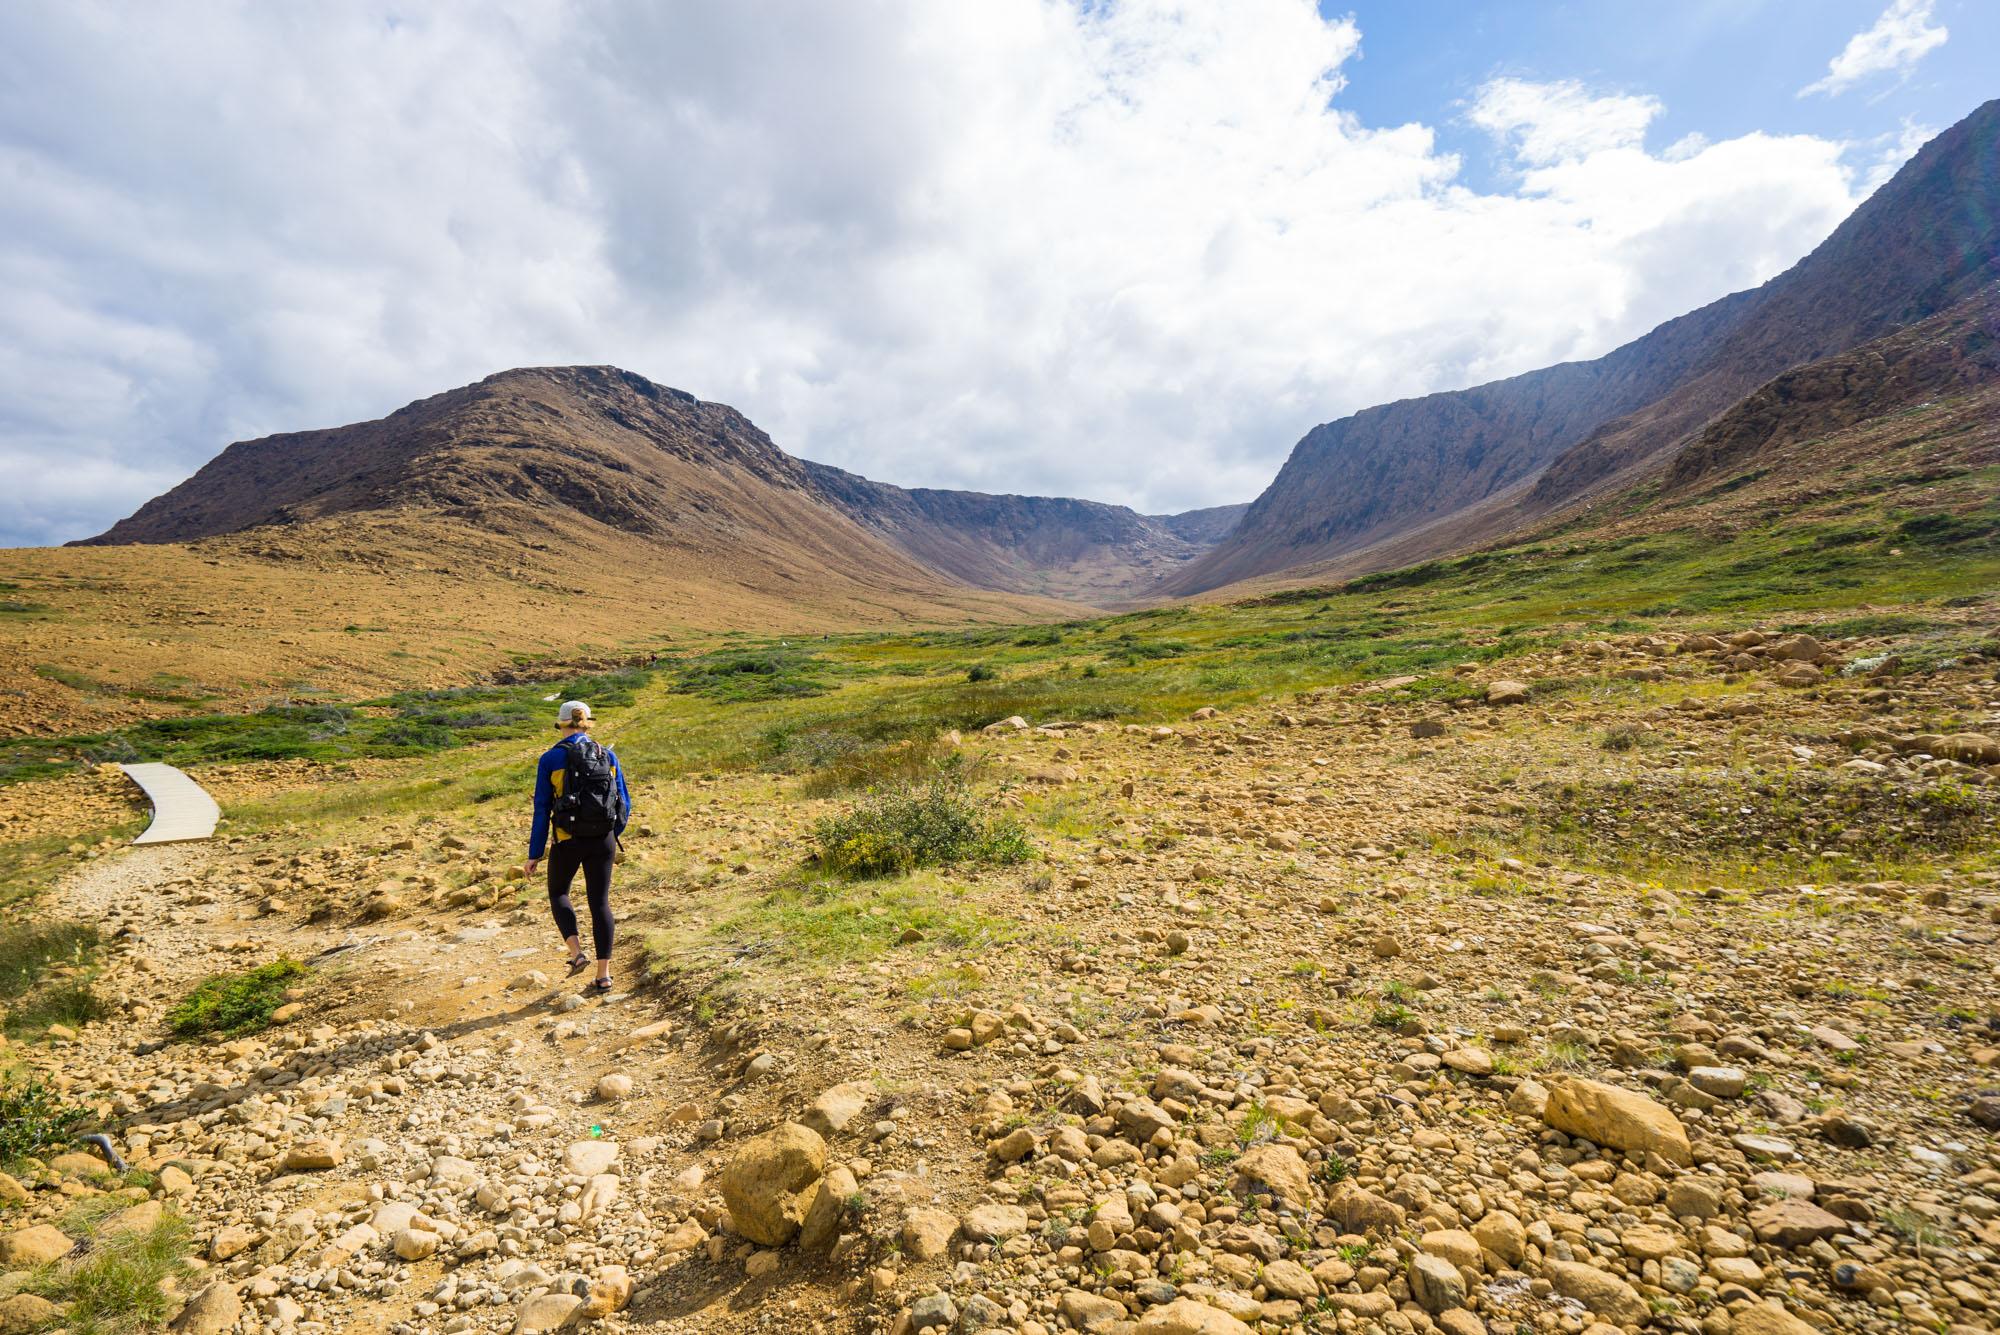 MAK hiking into the Tablelands